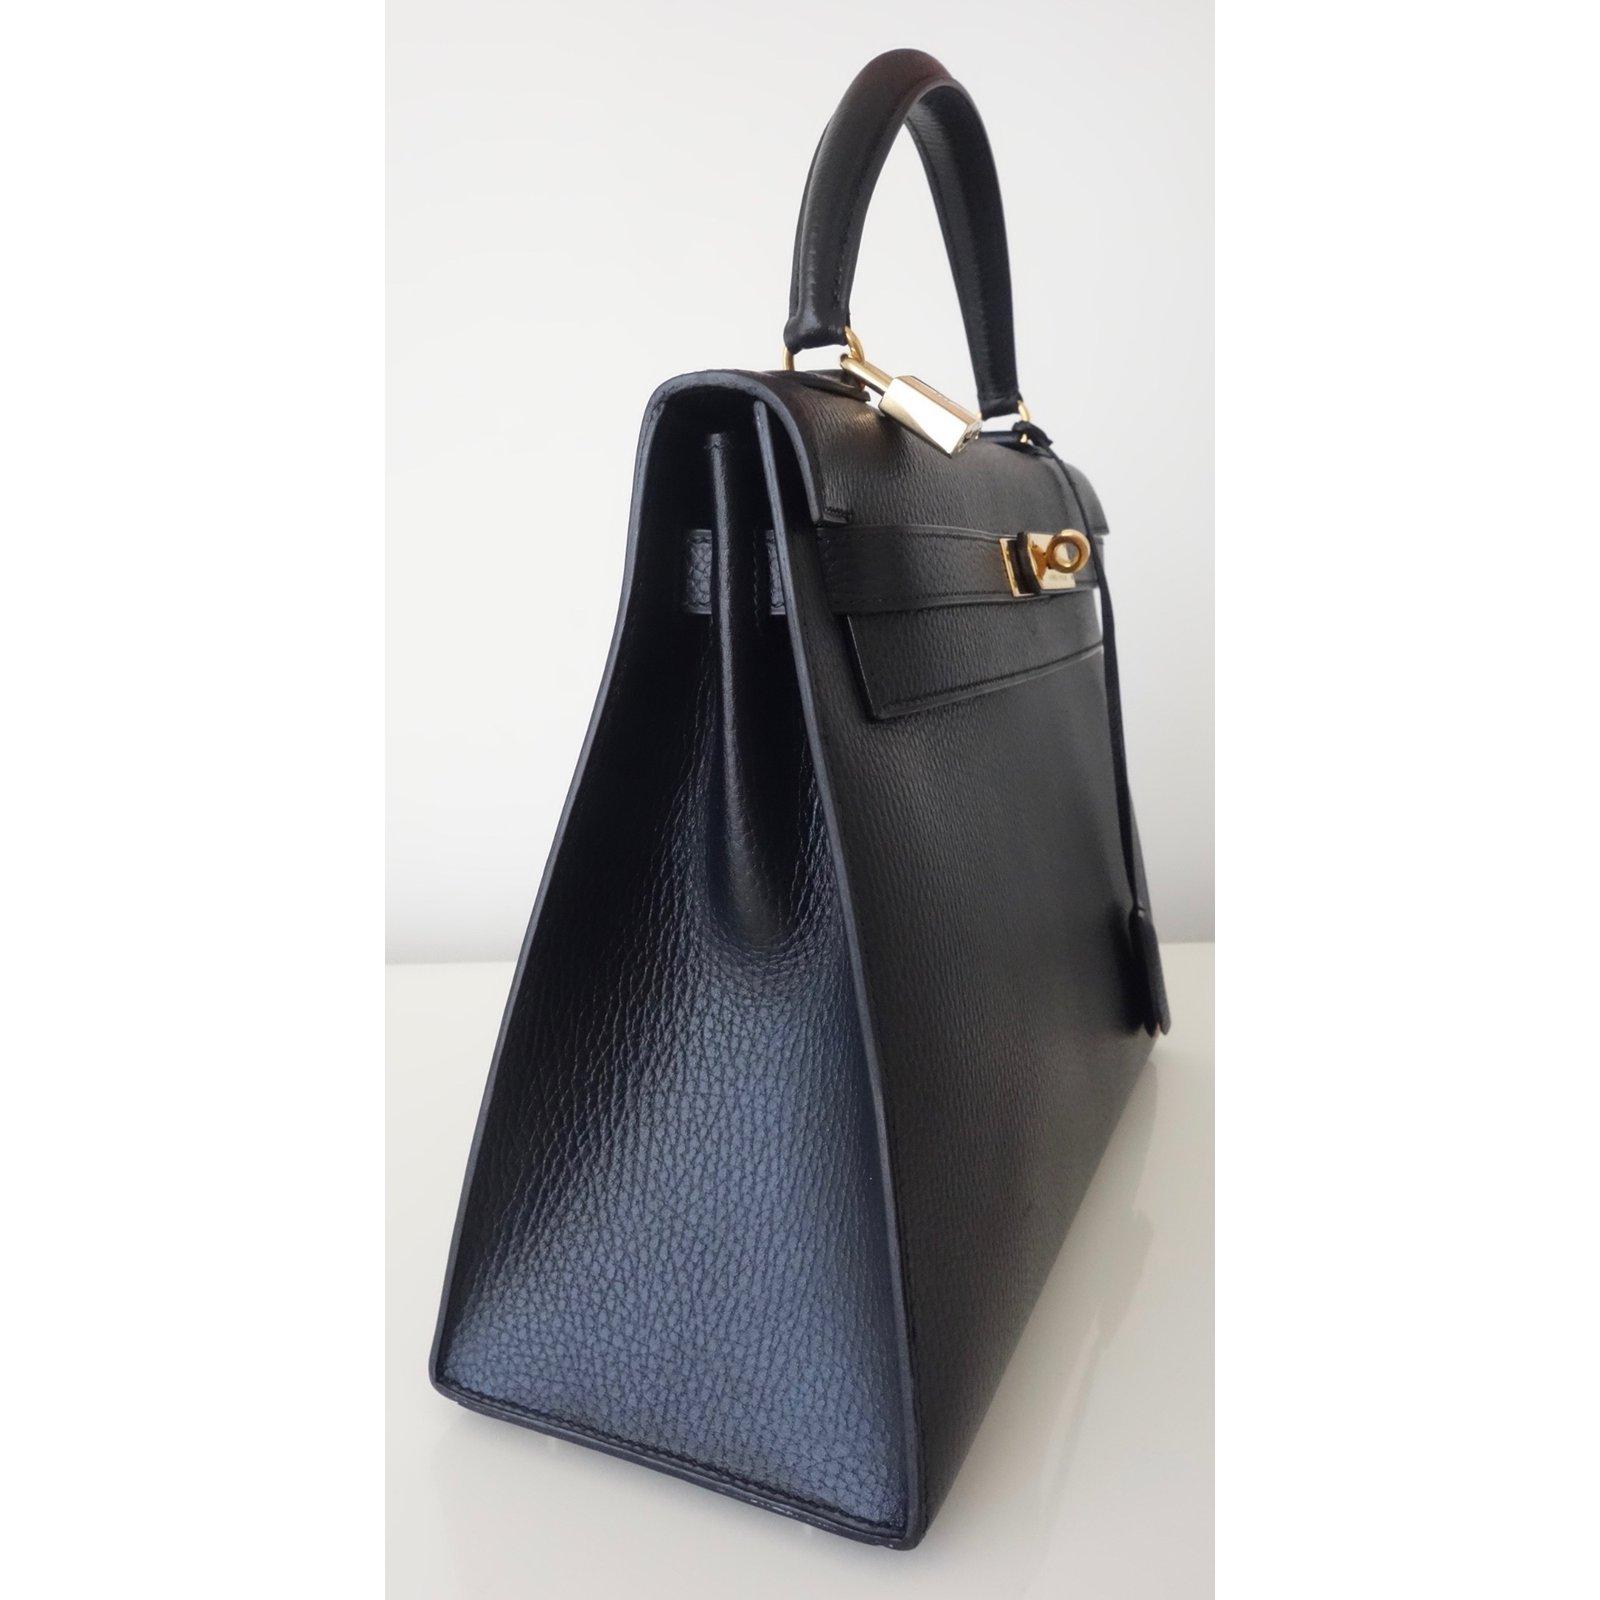 Sacs à main Hermès SAC HERMES KELLY 32 Togo Noir Cuir Noir ref.61961 - Joli  Closet f82442a5930